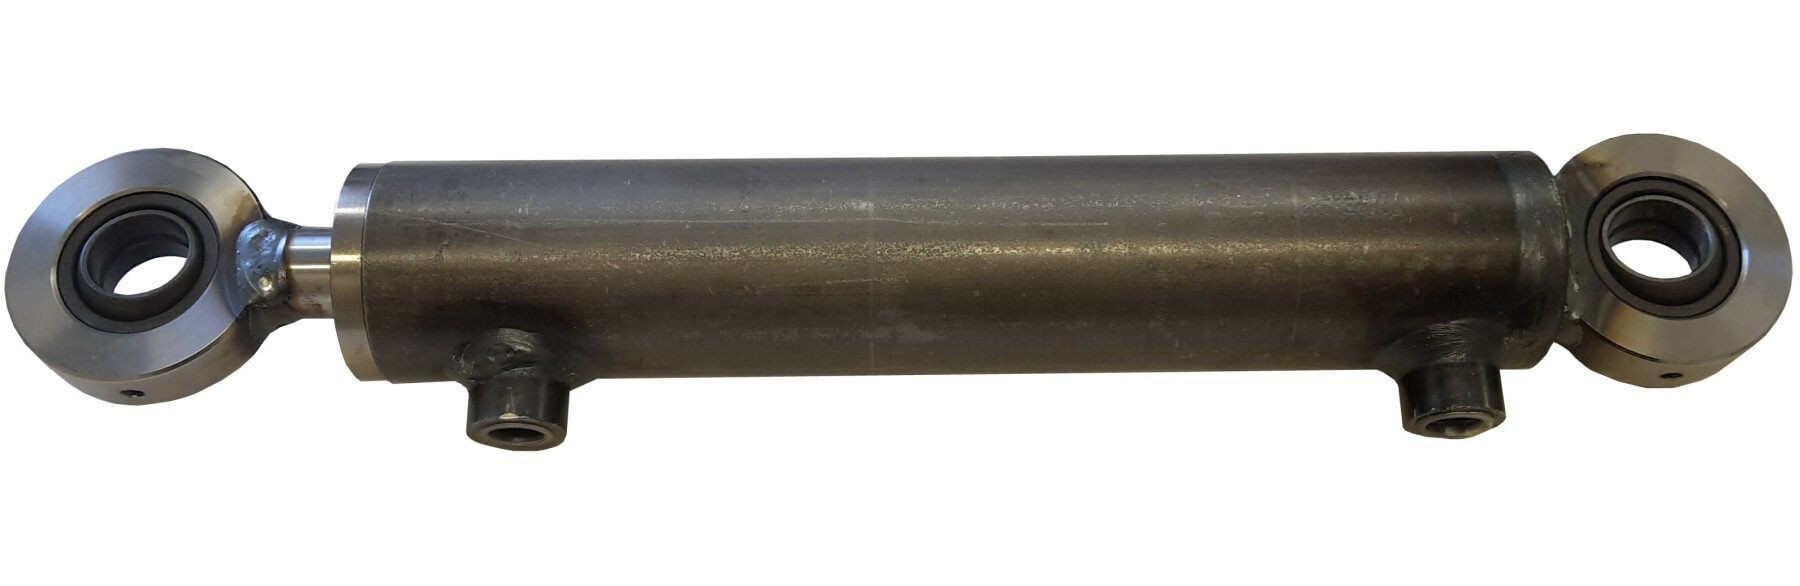 Hydraulisylinteri CL 70. 40. 200 GE